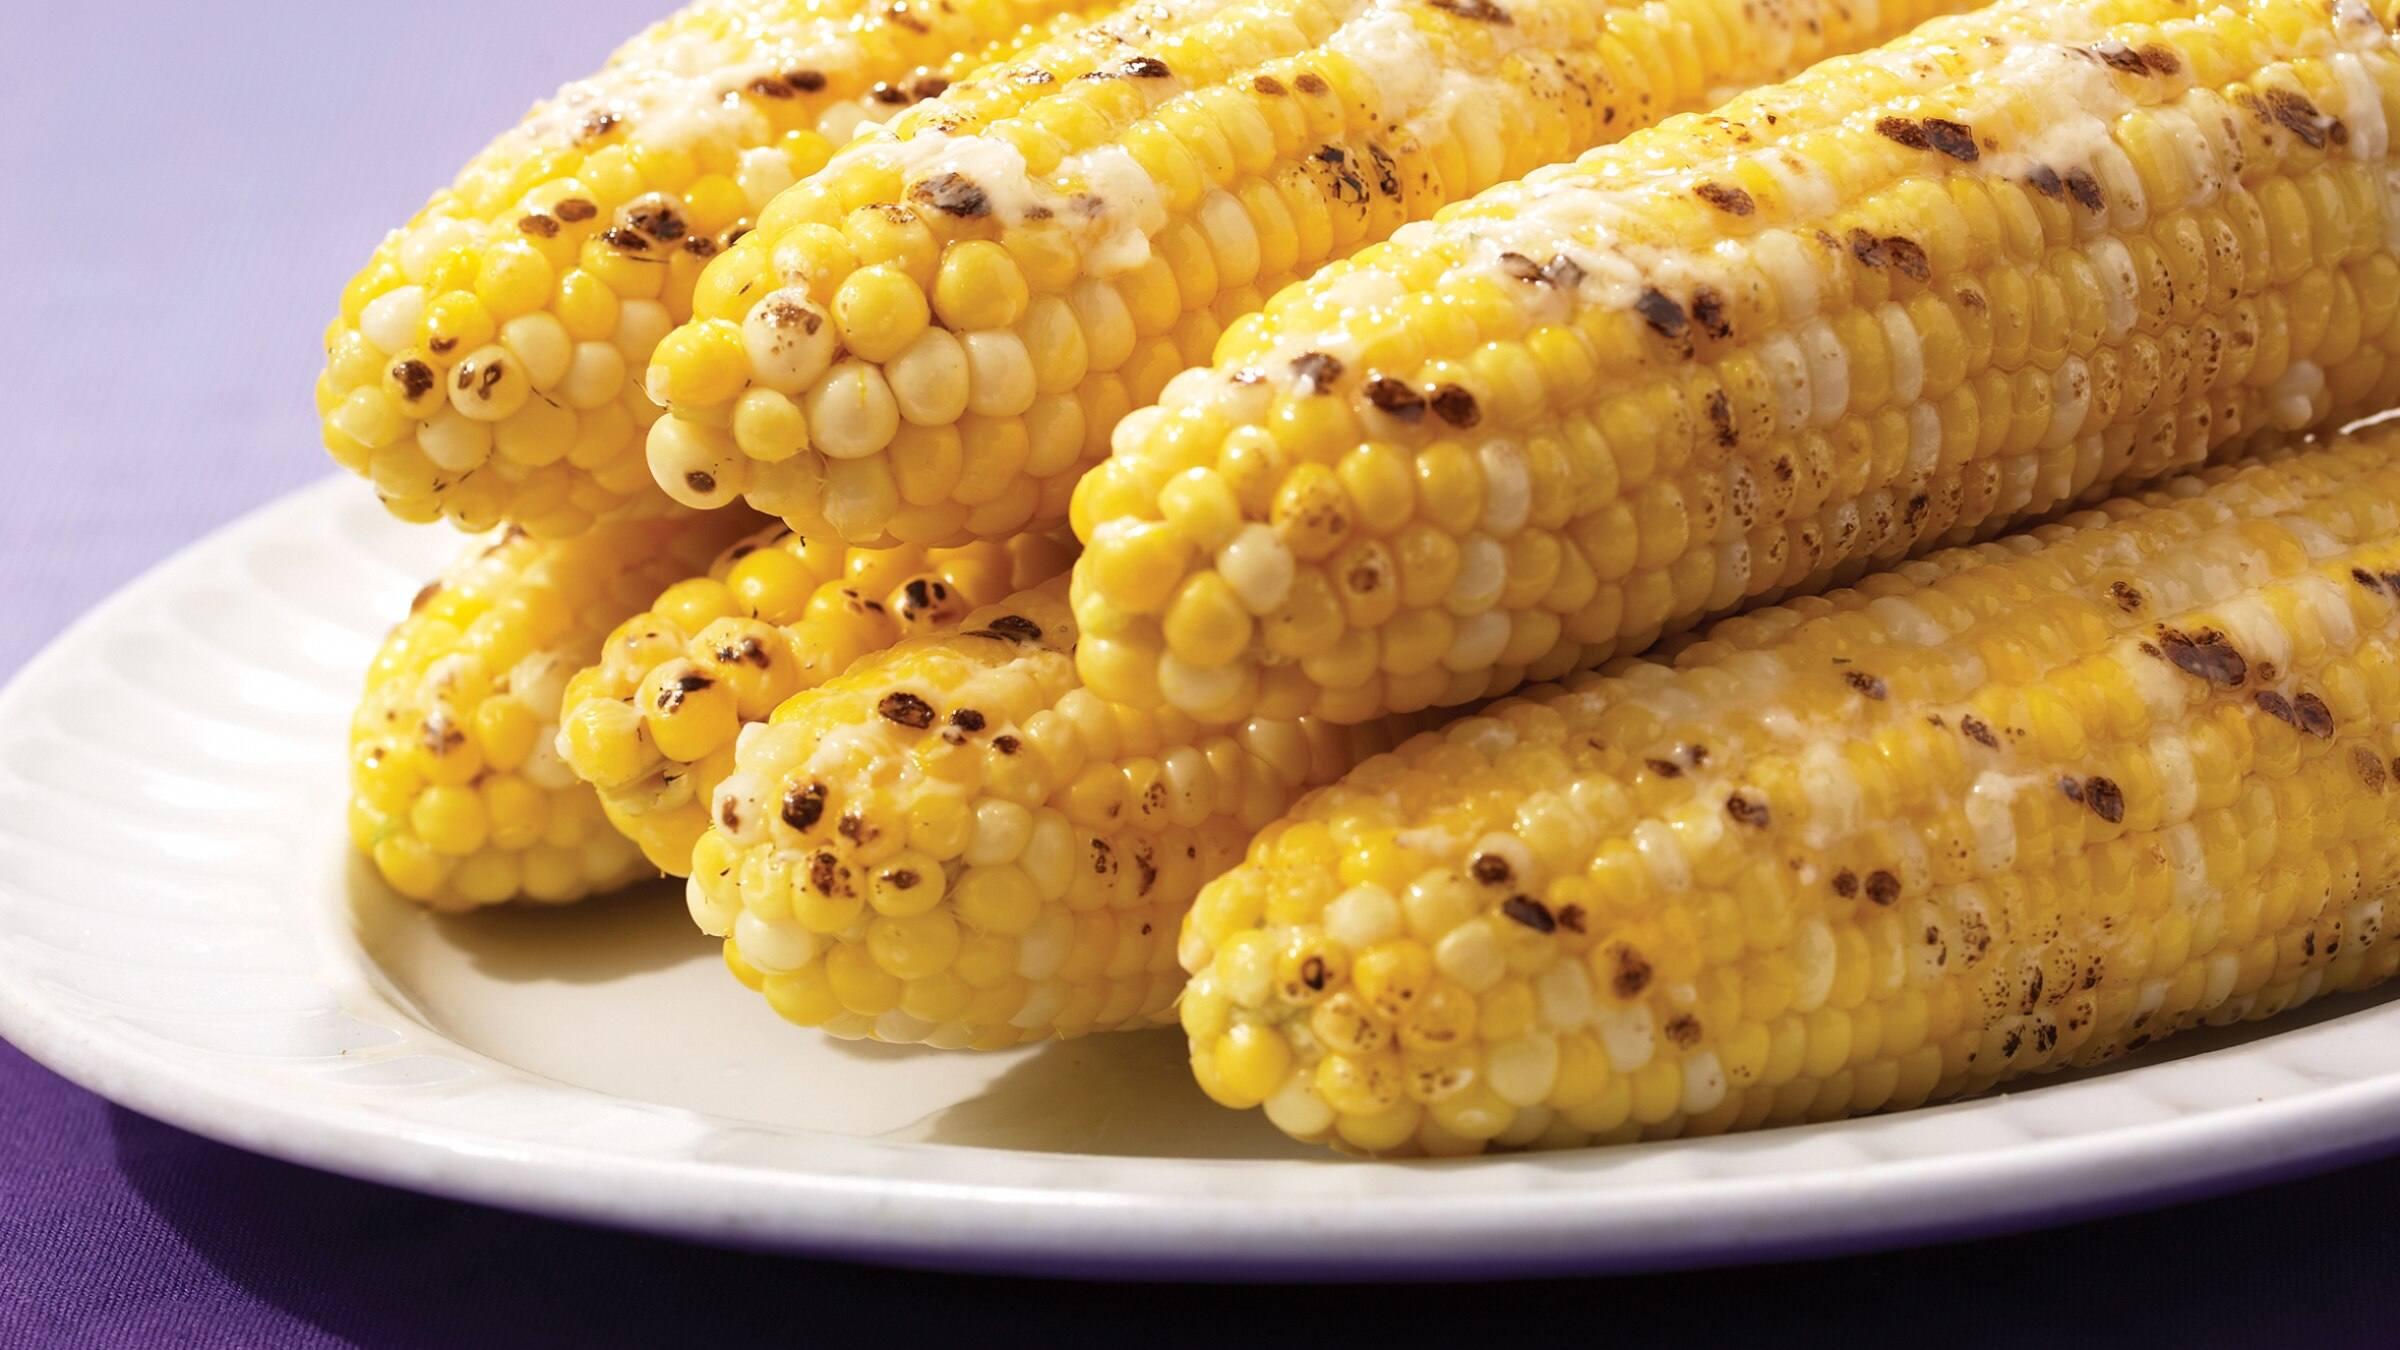 Summer Spicy Iowa Corn-on-the-Cob